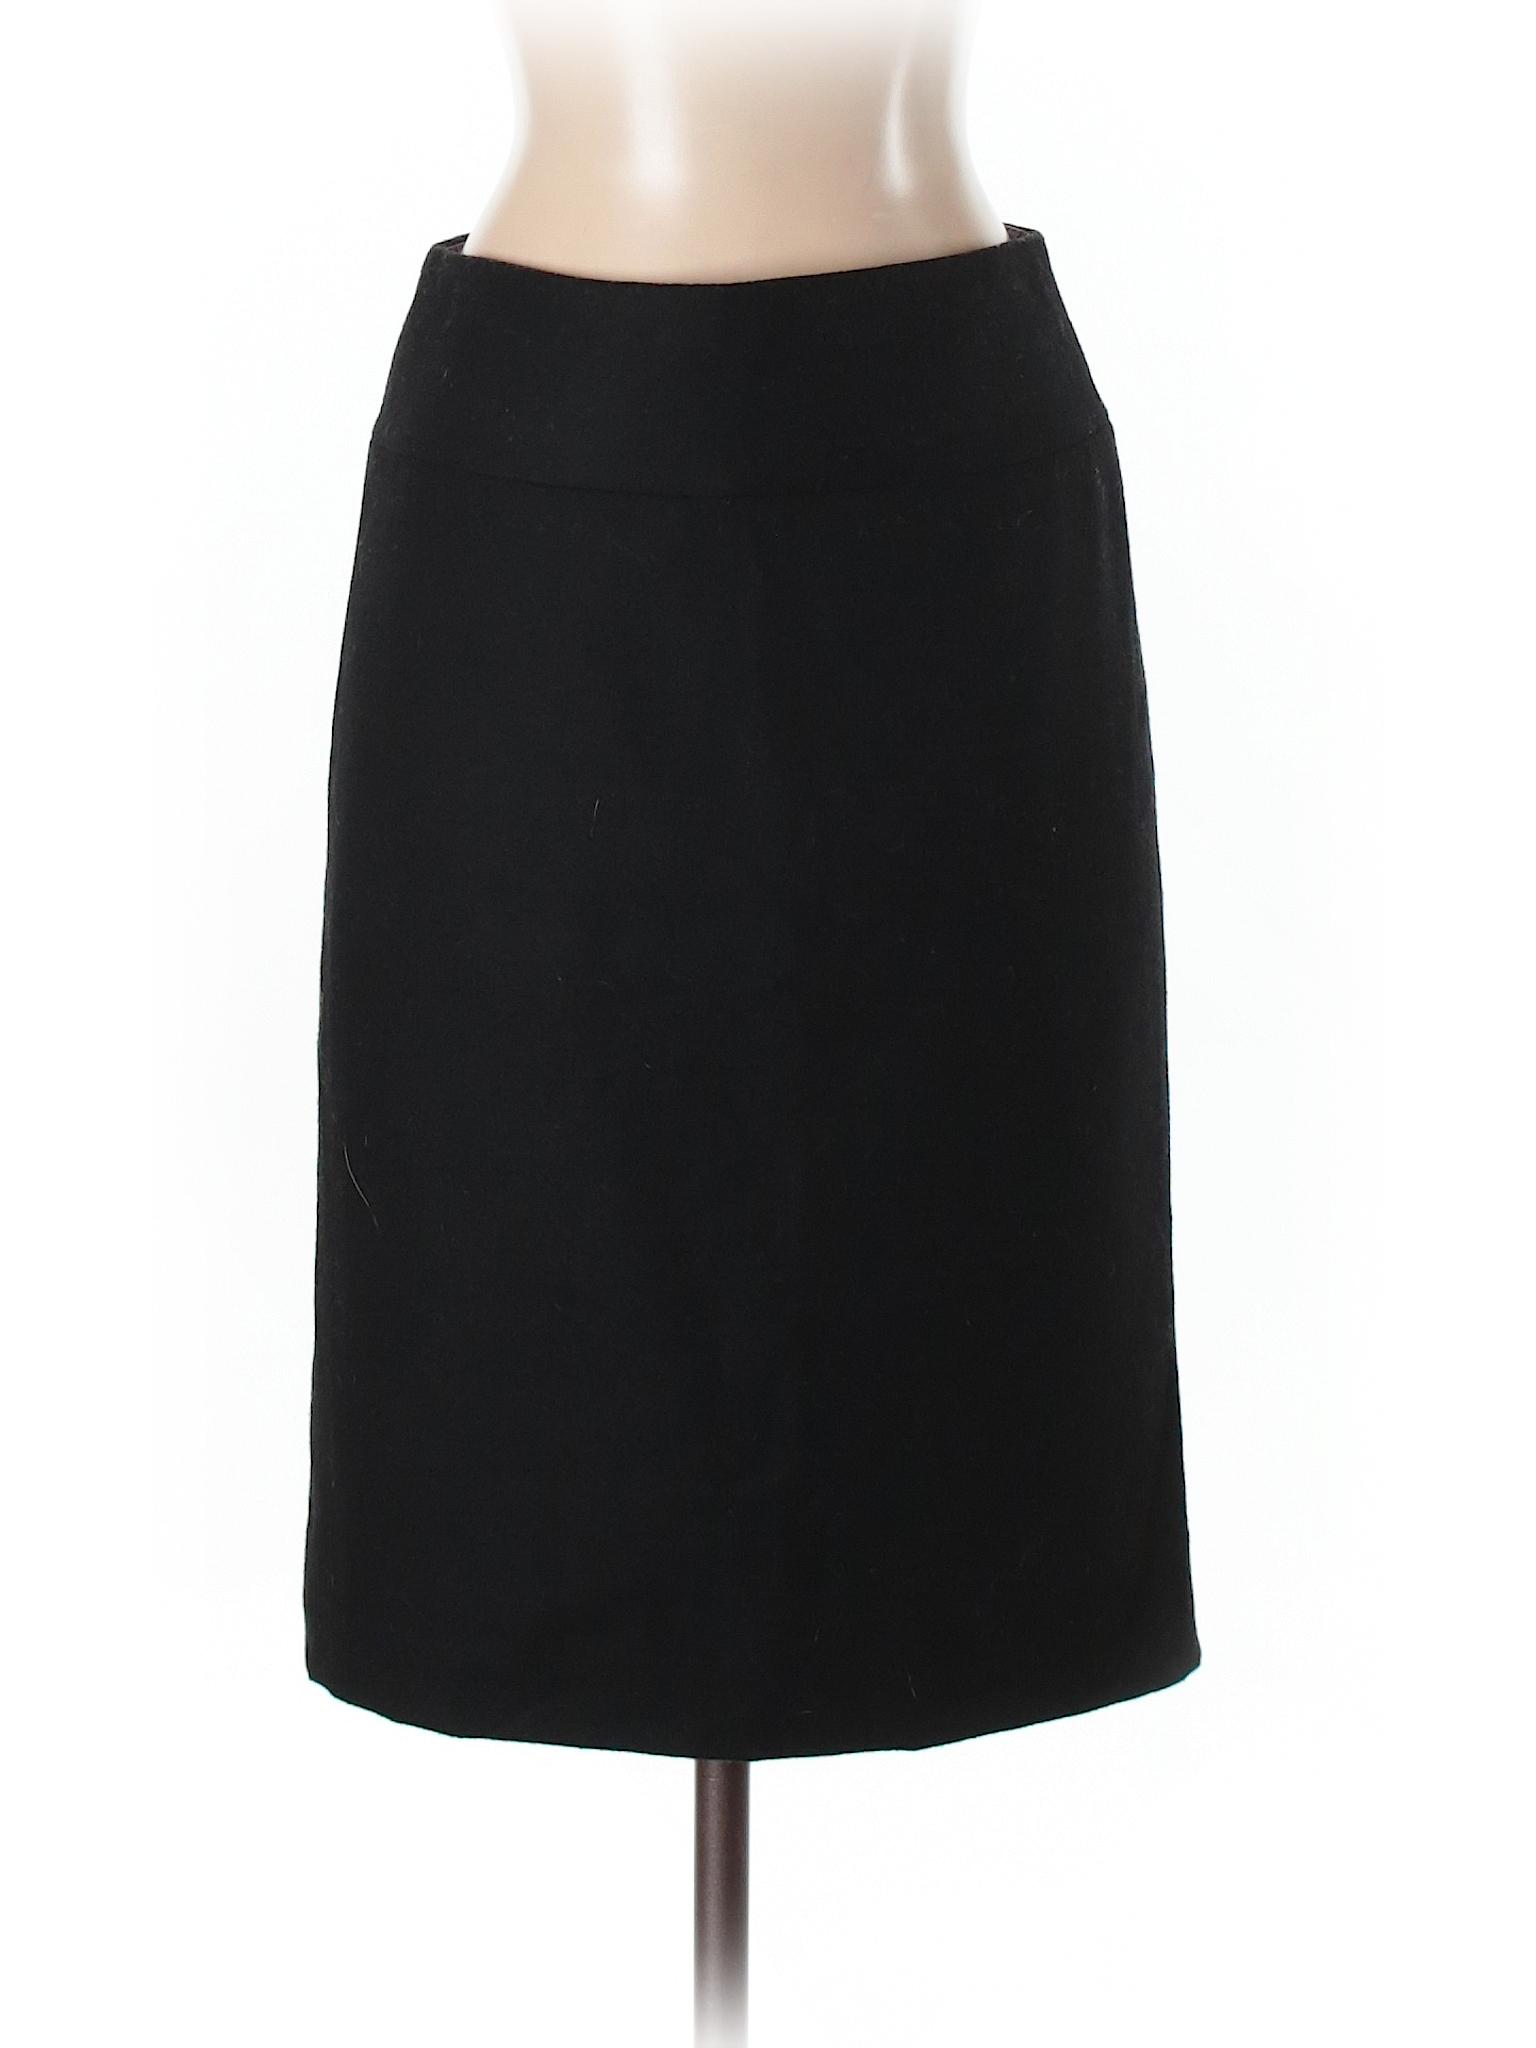 Boutique Wool Skirt Wool Skirt Boutique Wool Wool Boutique Skirt Boutique xq4HBwx